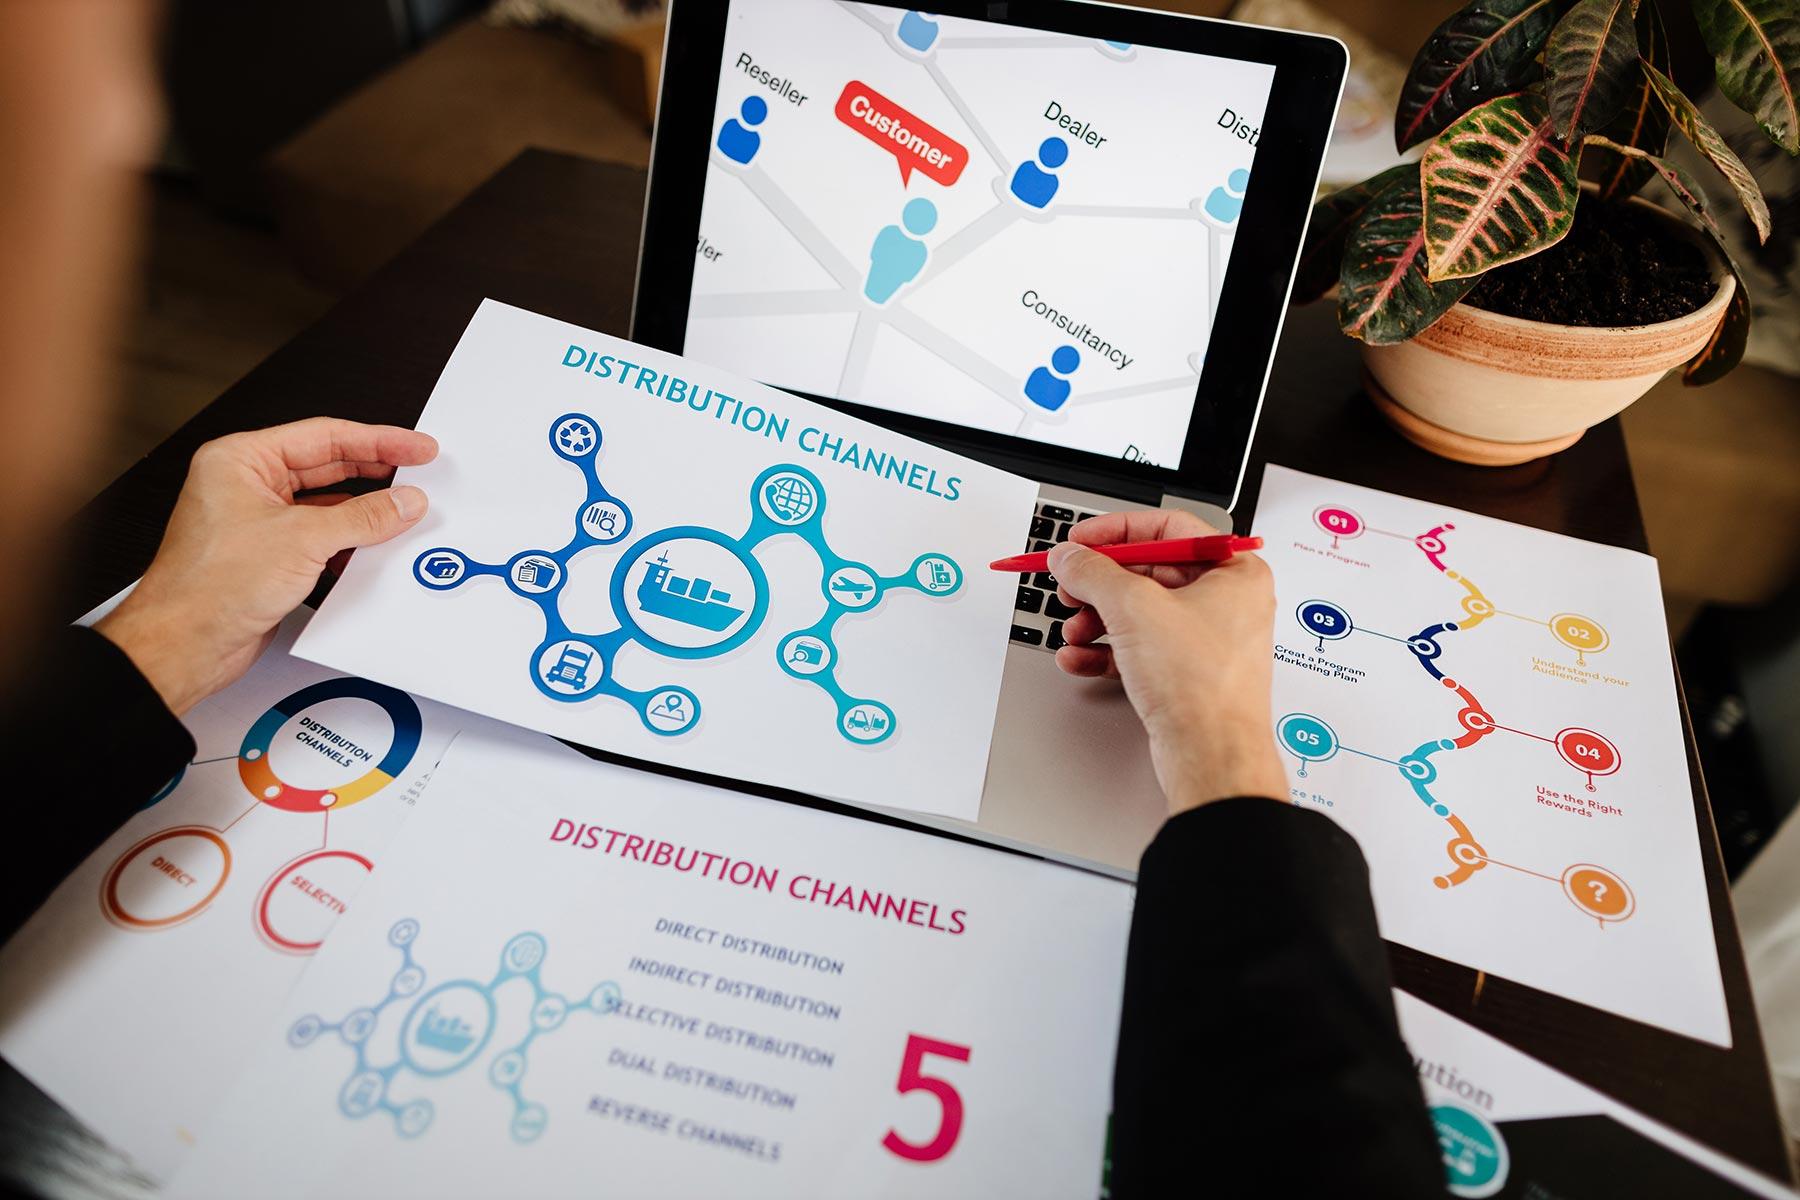 marketing-distribution-channels-plan-on-office-des-CV8GZ87.jpg